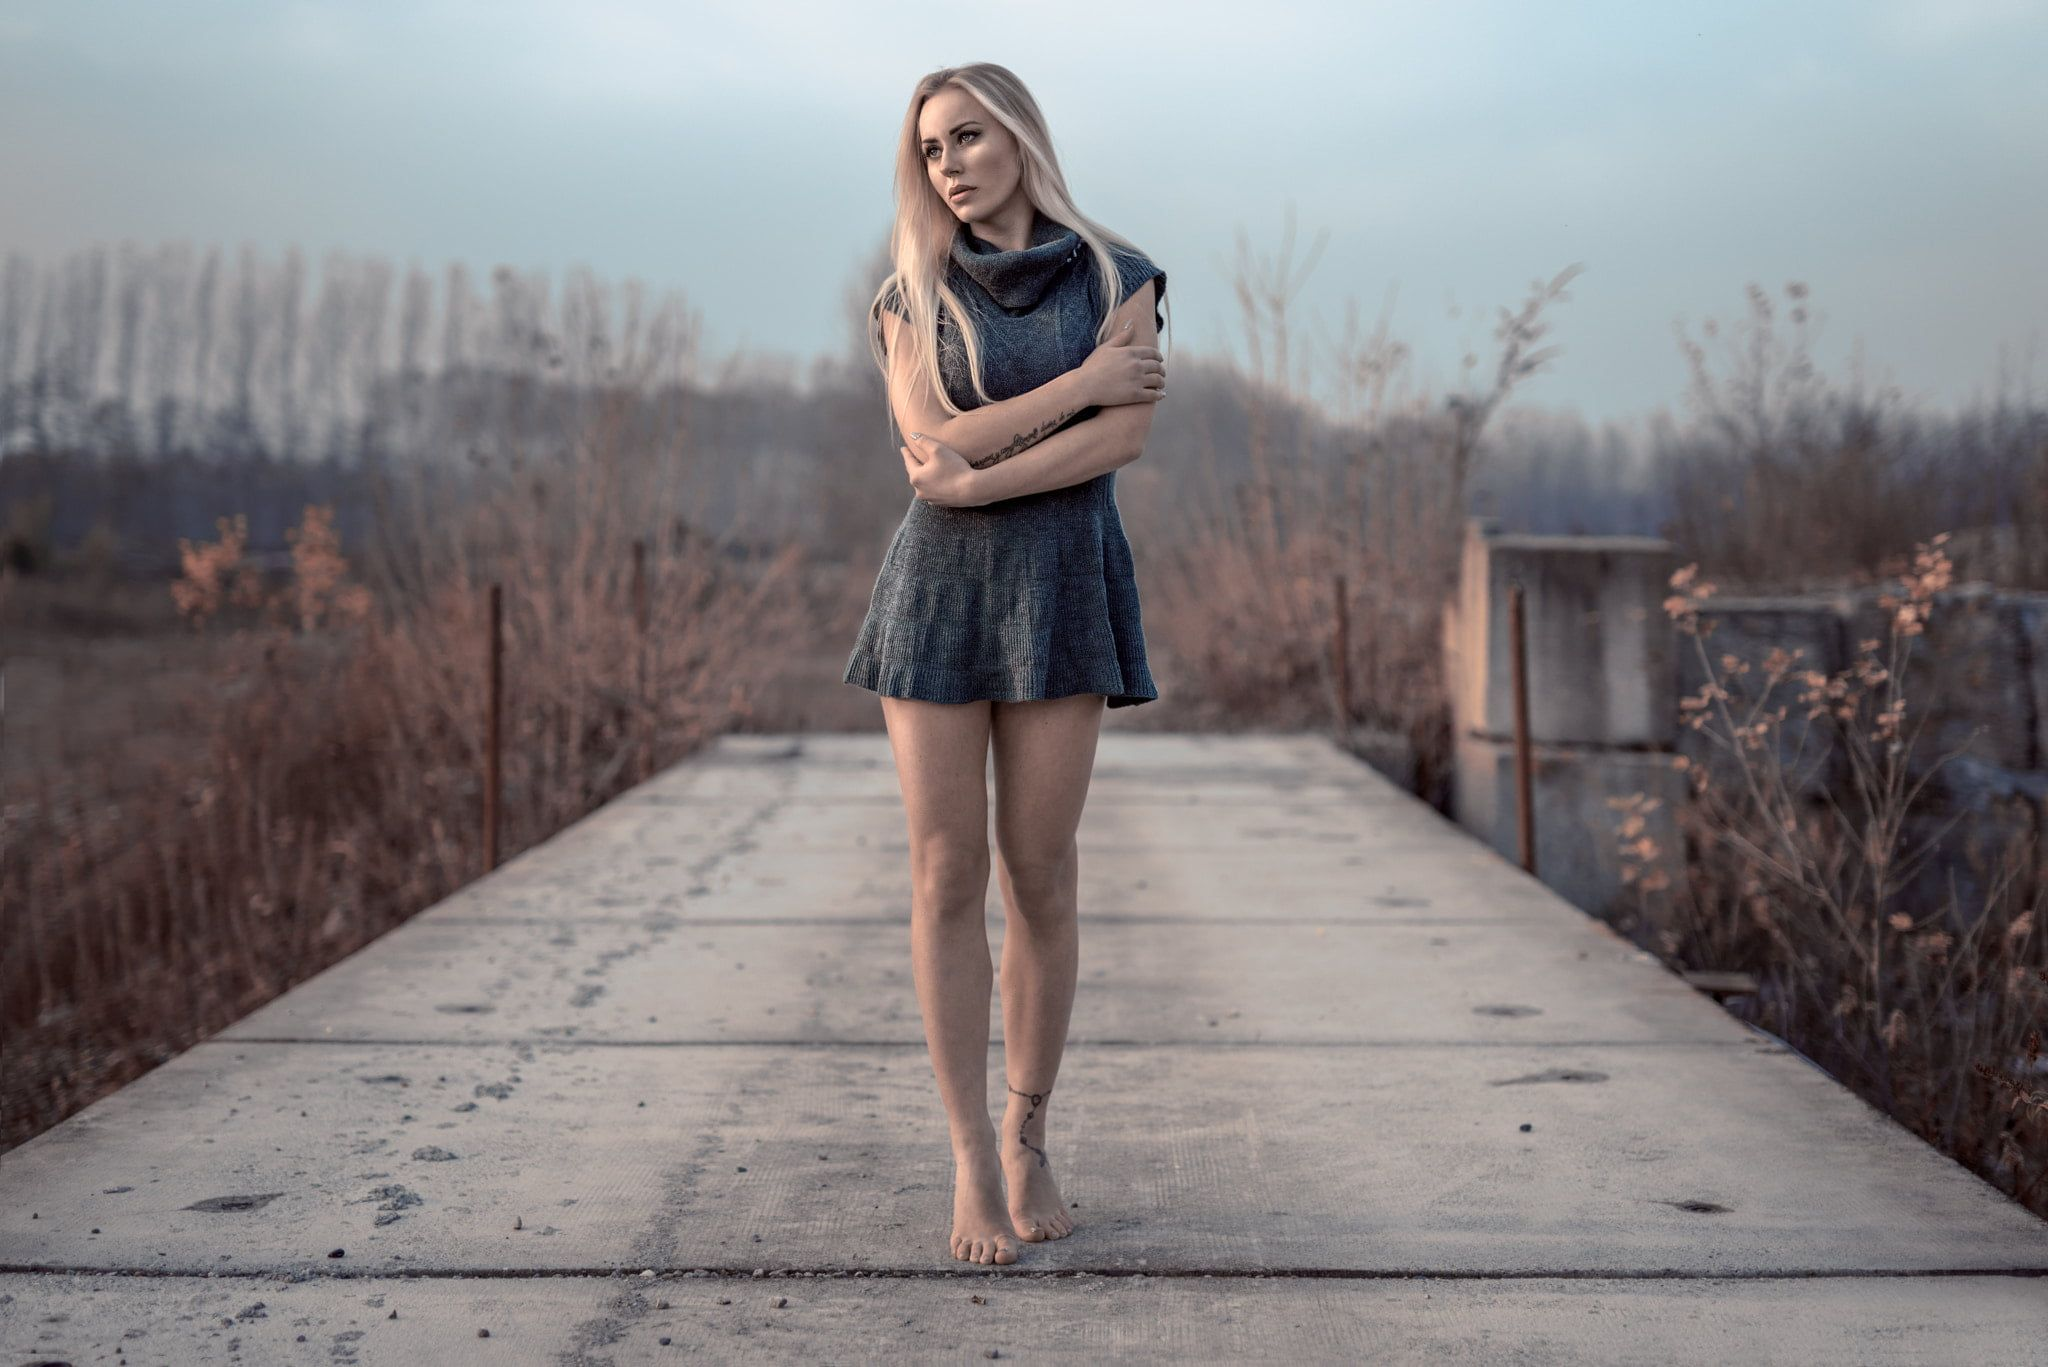 Pin By Devan Pretorius On Feet Me Heel Me Thrill Me Perfect Pair Short Sleeve Mini Dress Womens Black Shorts Women